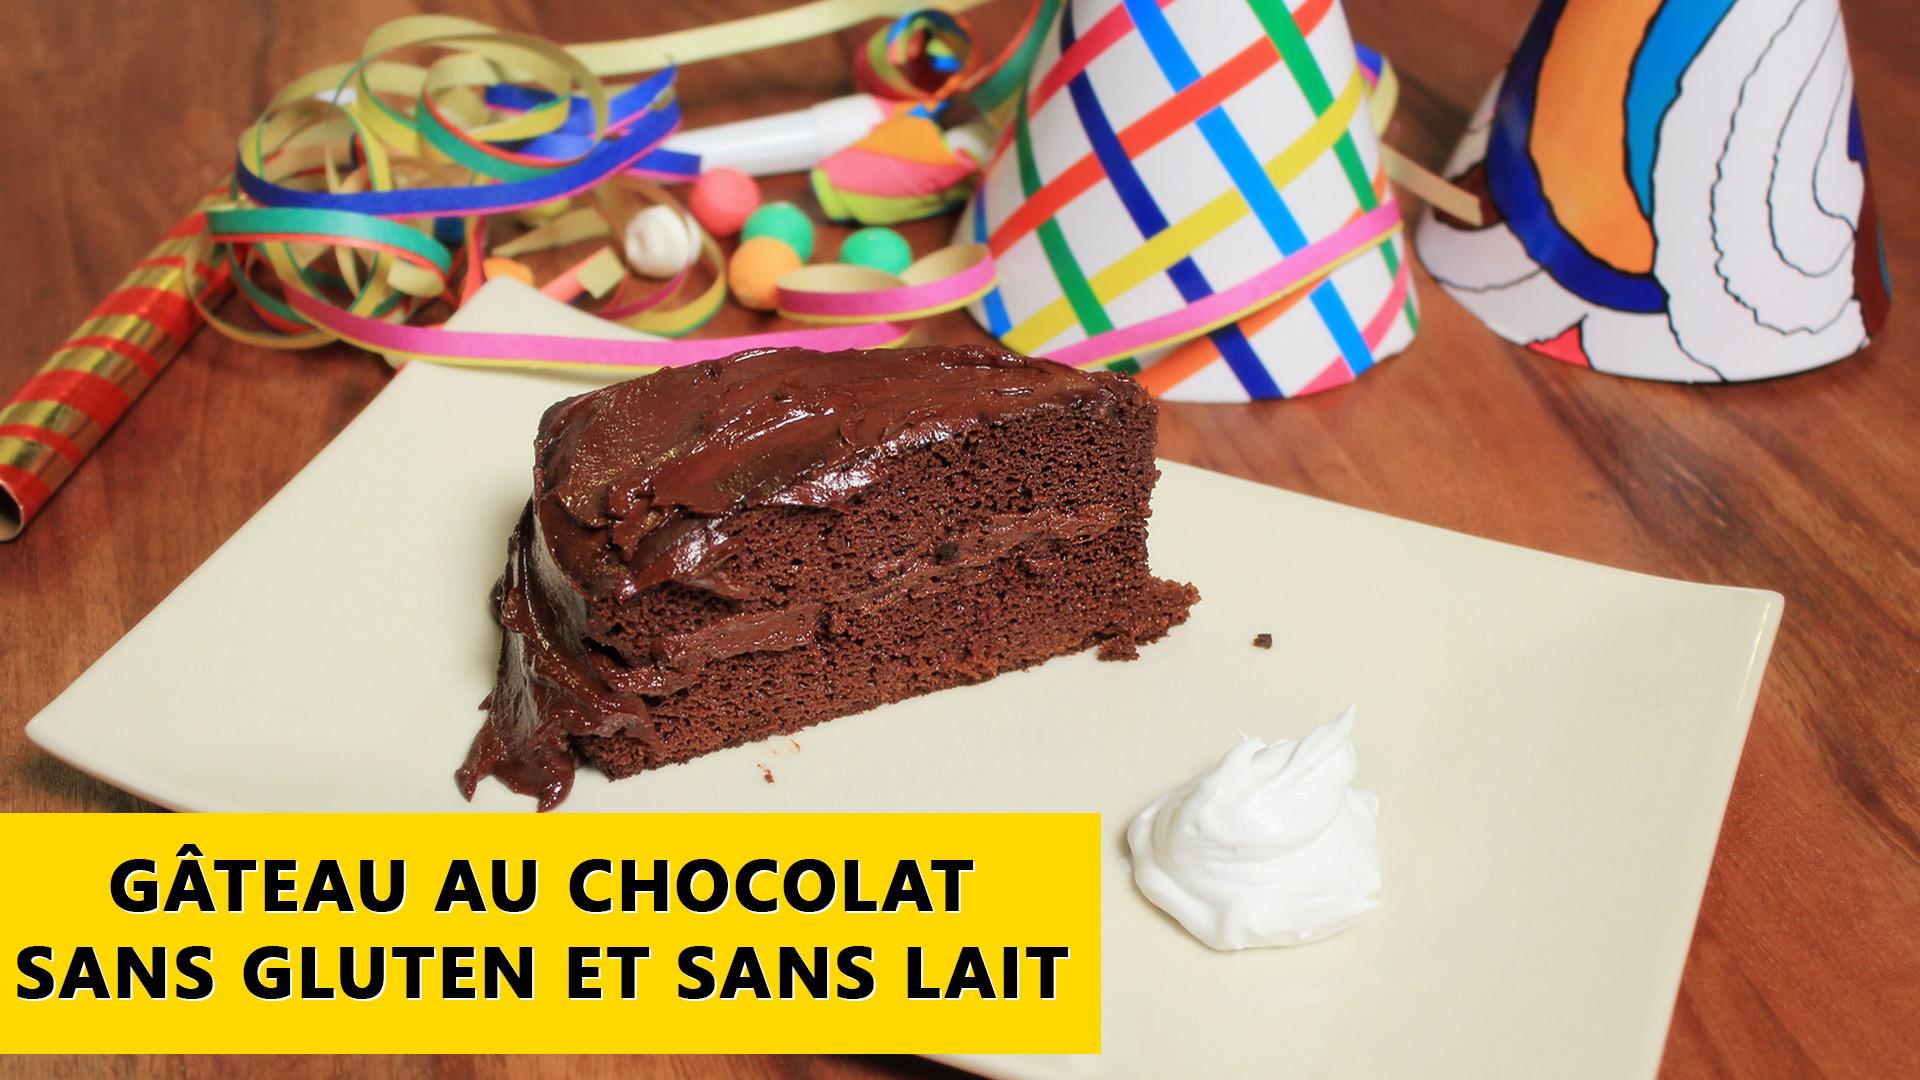 gateau-chocolat-sans-gluten-couv